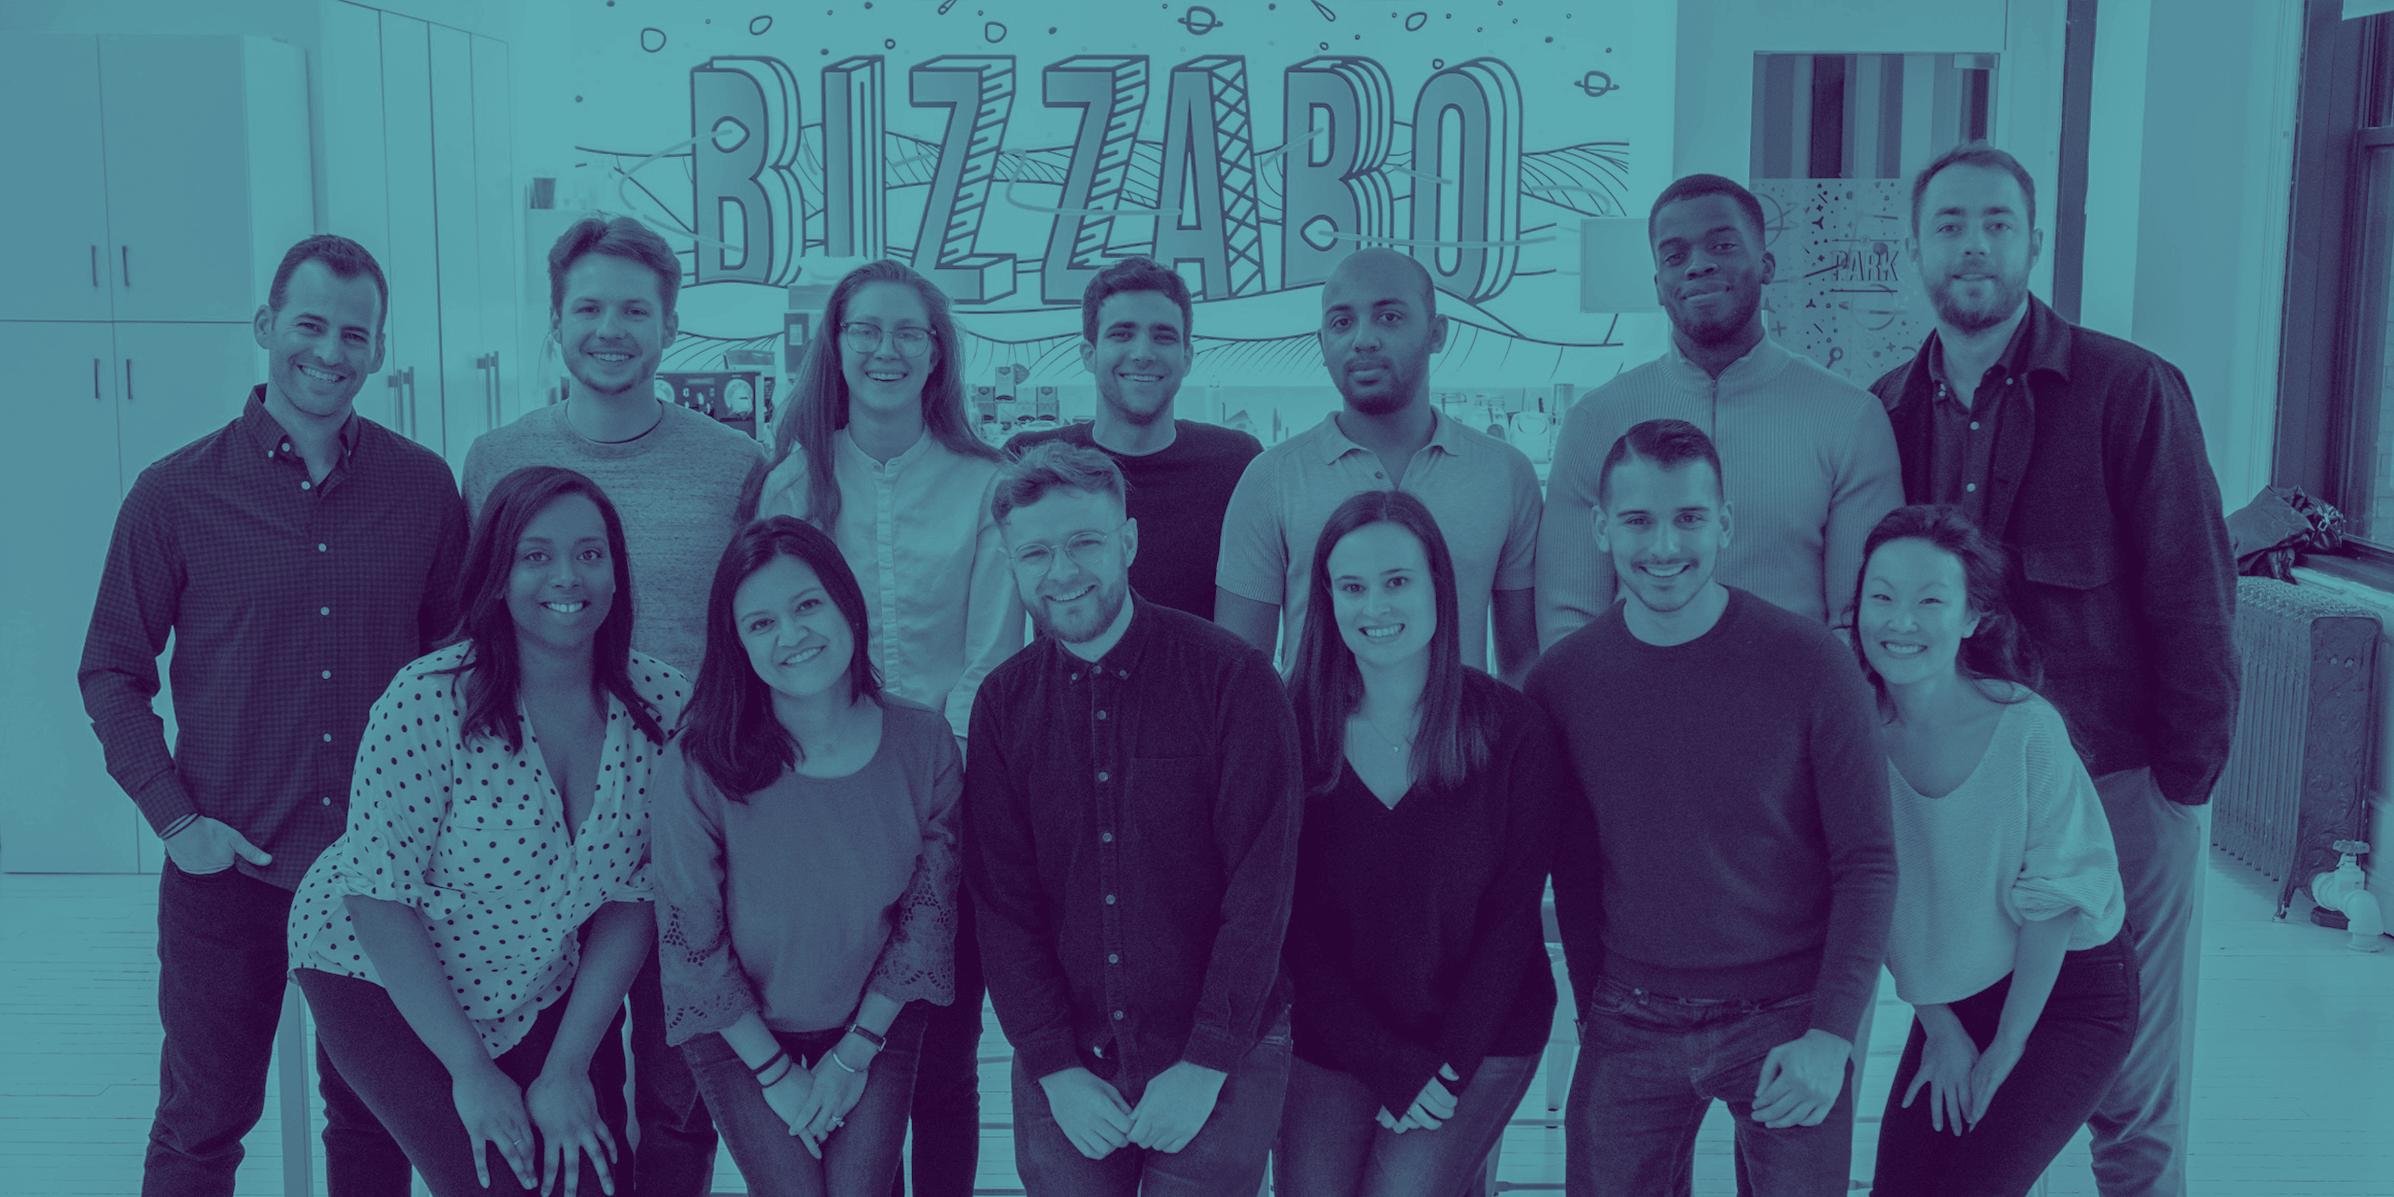 Meet the Customer Success Team at Bizzabo!